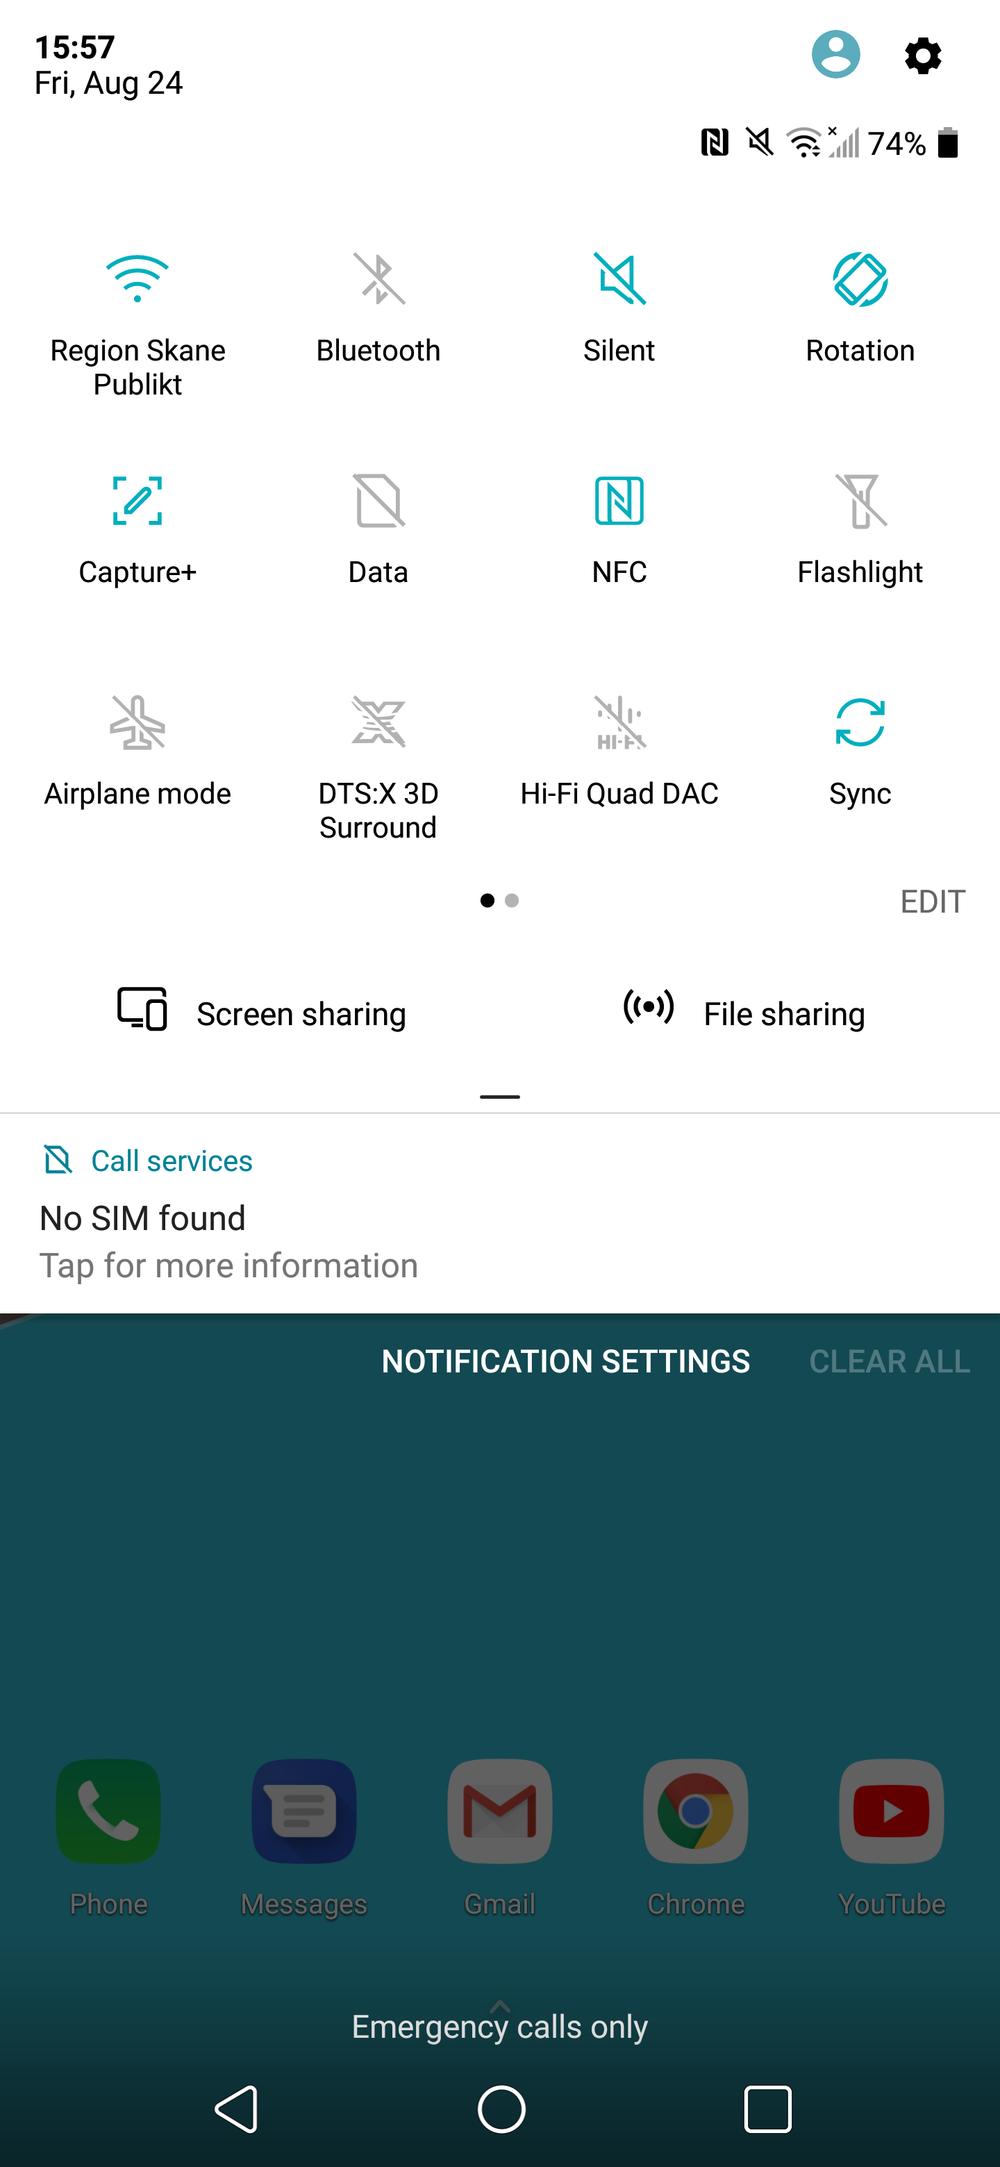 Screenshot_2018-08-24-15-57-42.png